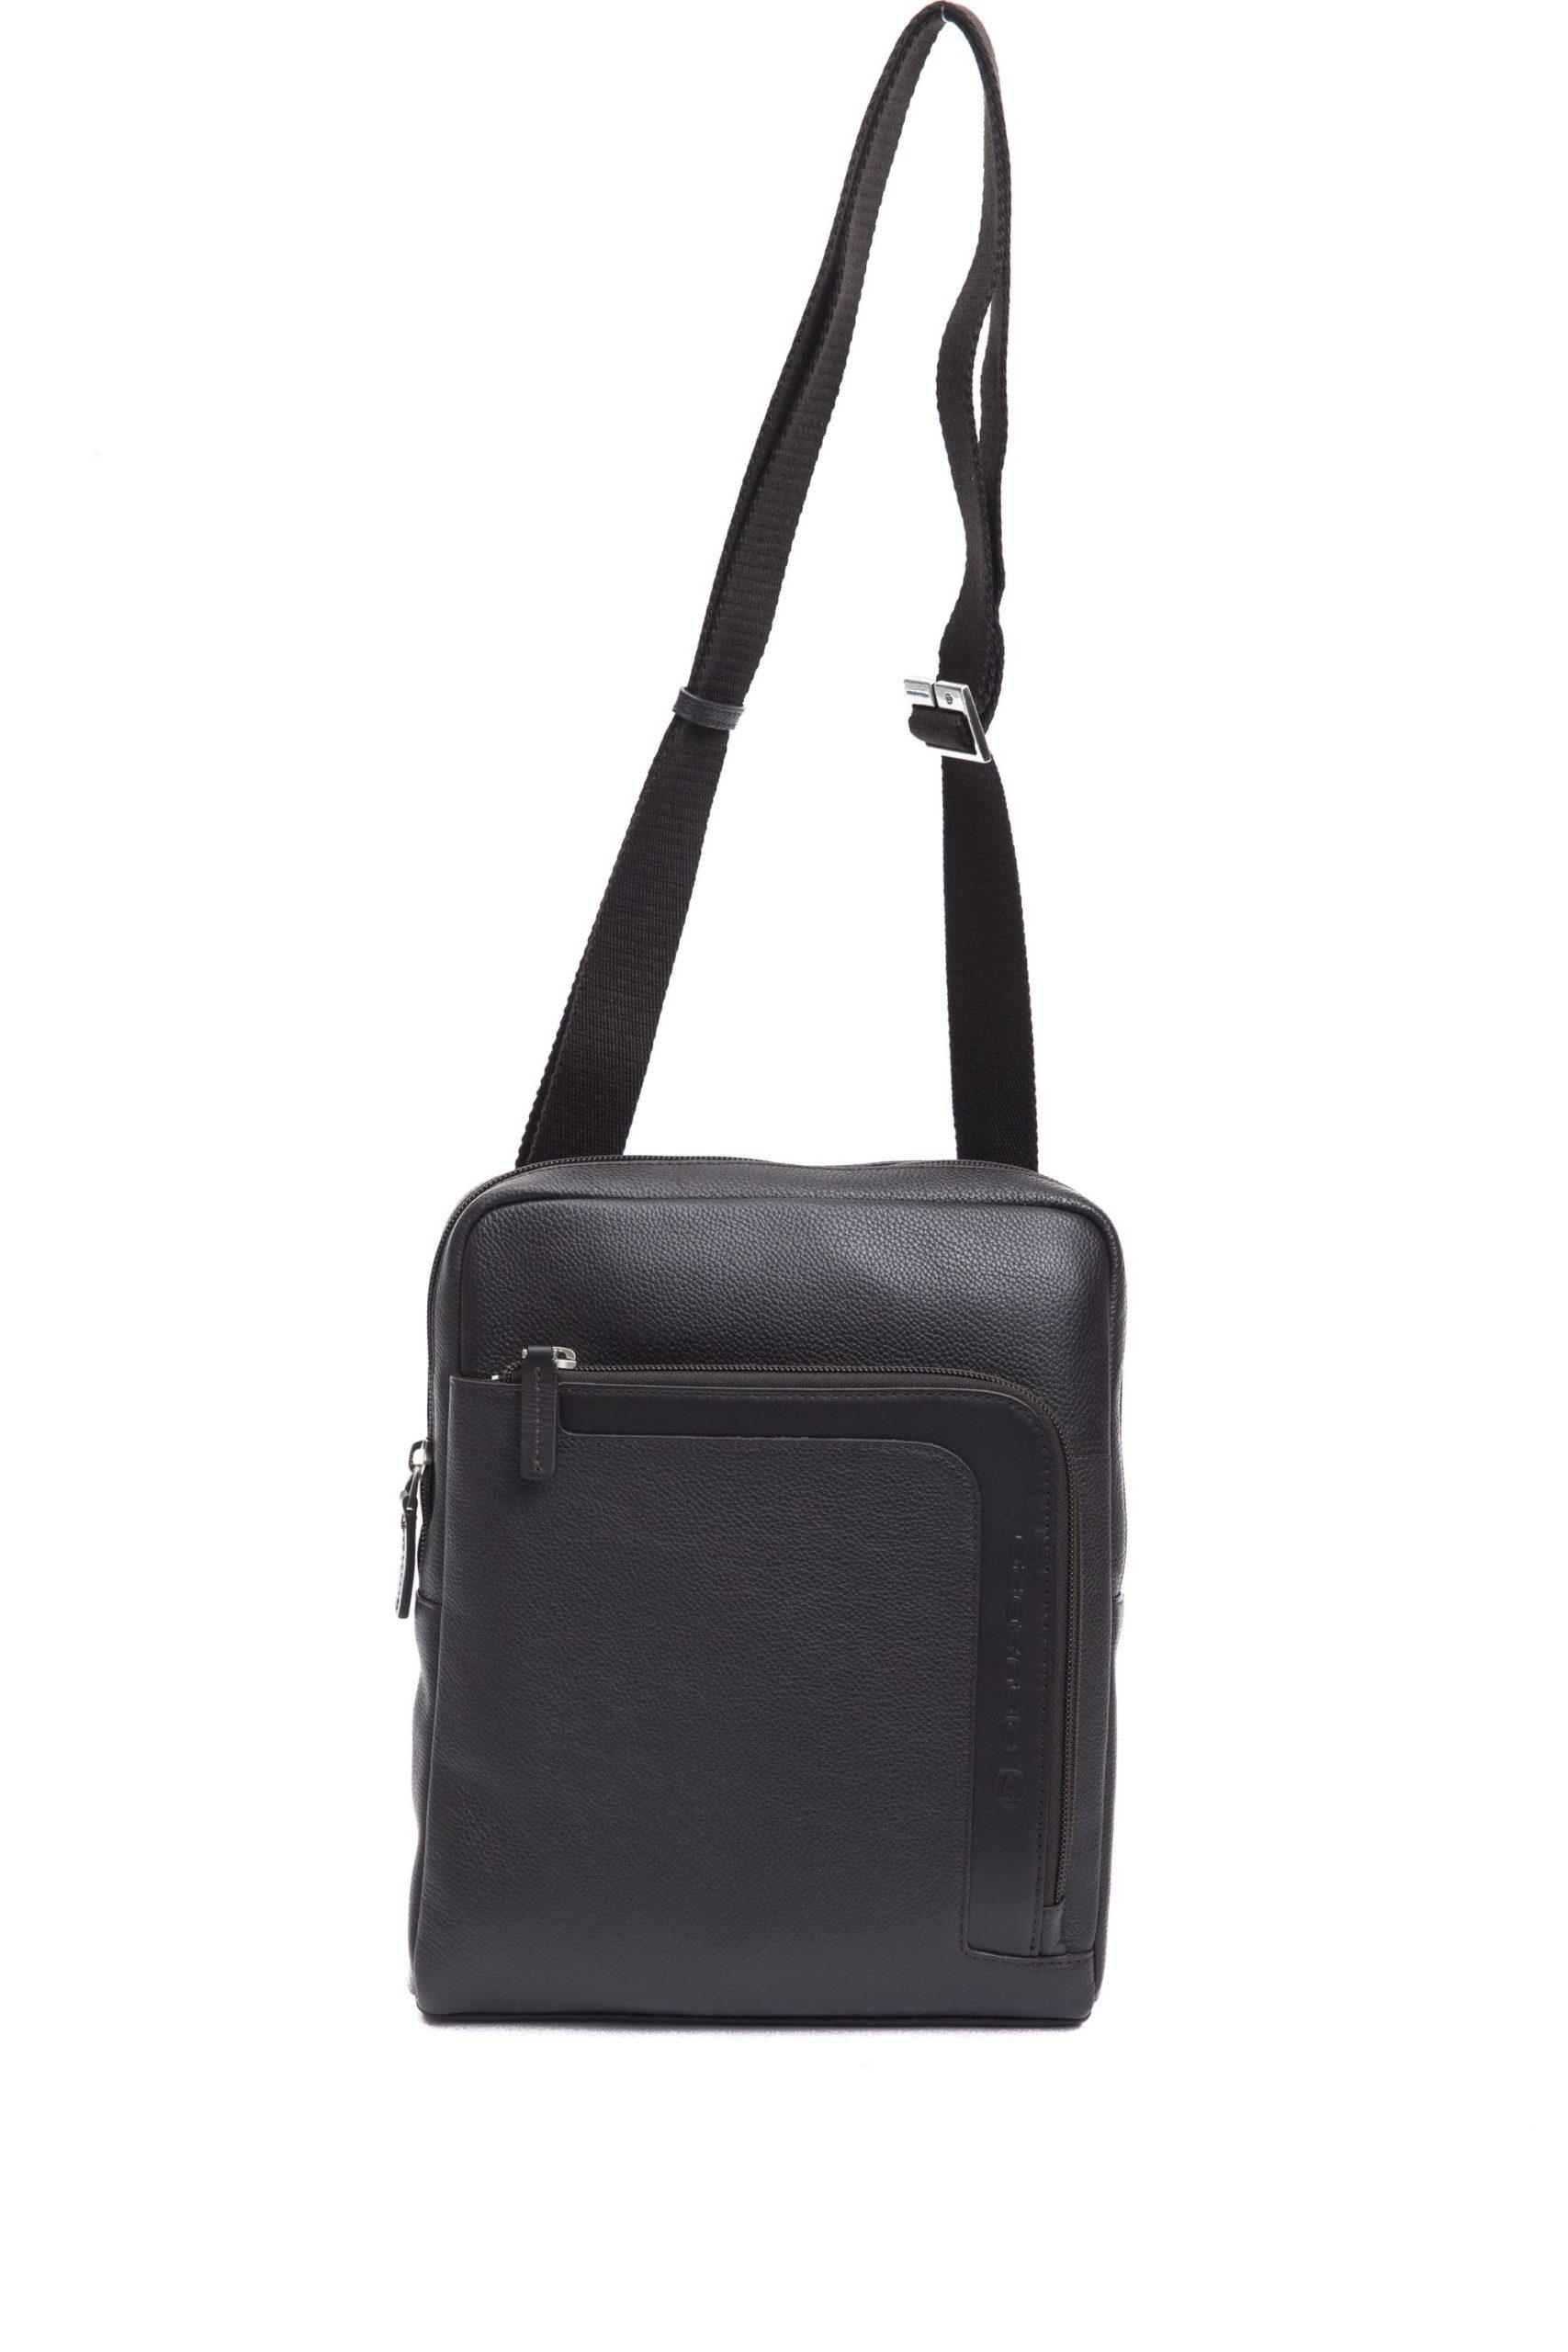 Piquadro Men's Marrone Messenger Bag Brown PI1270739